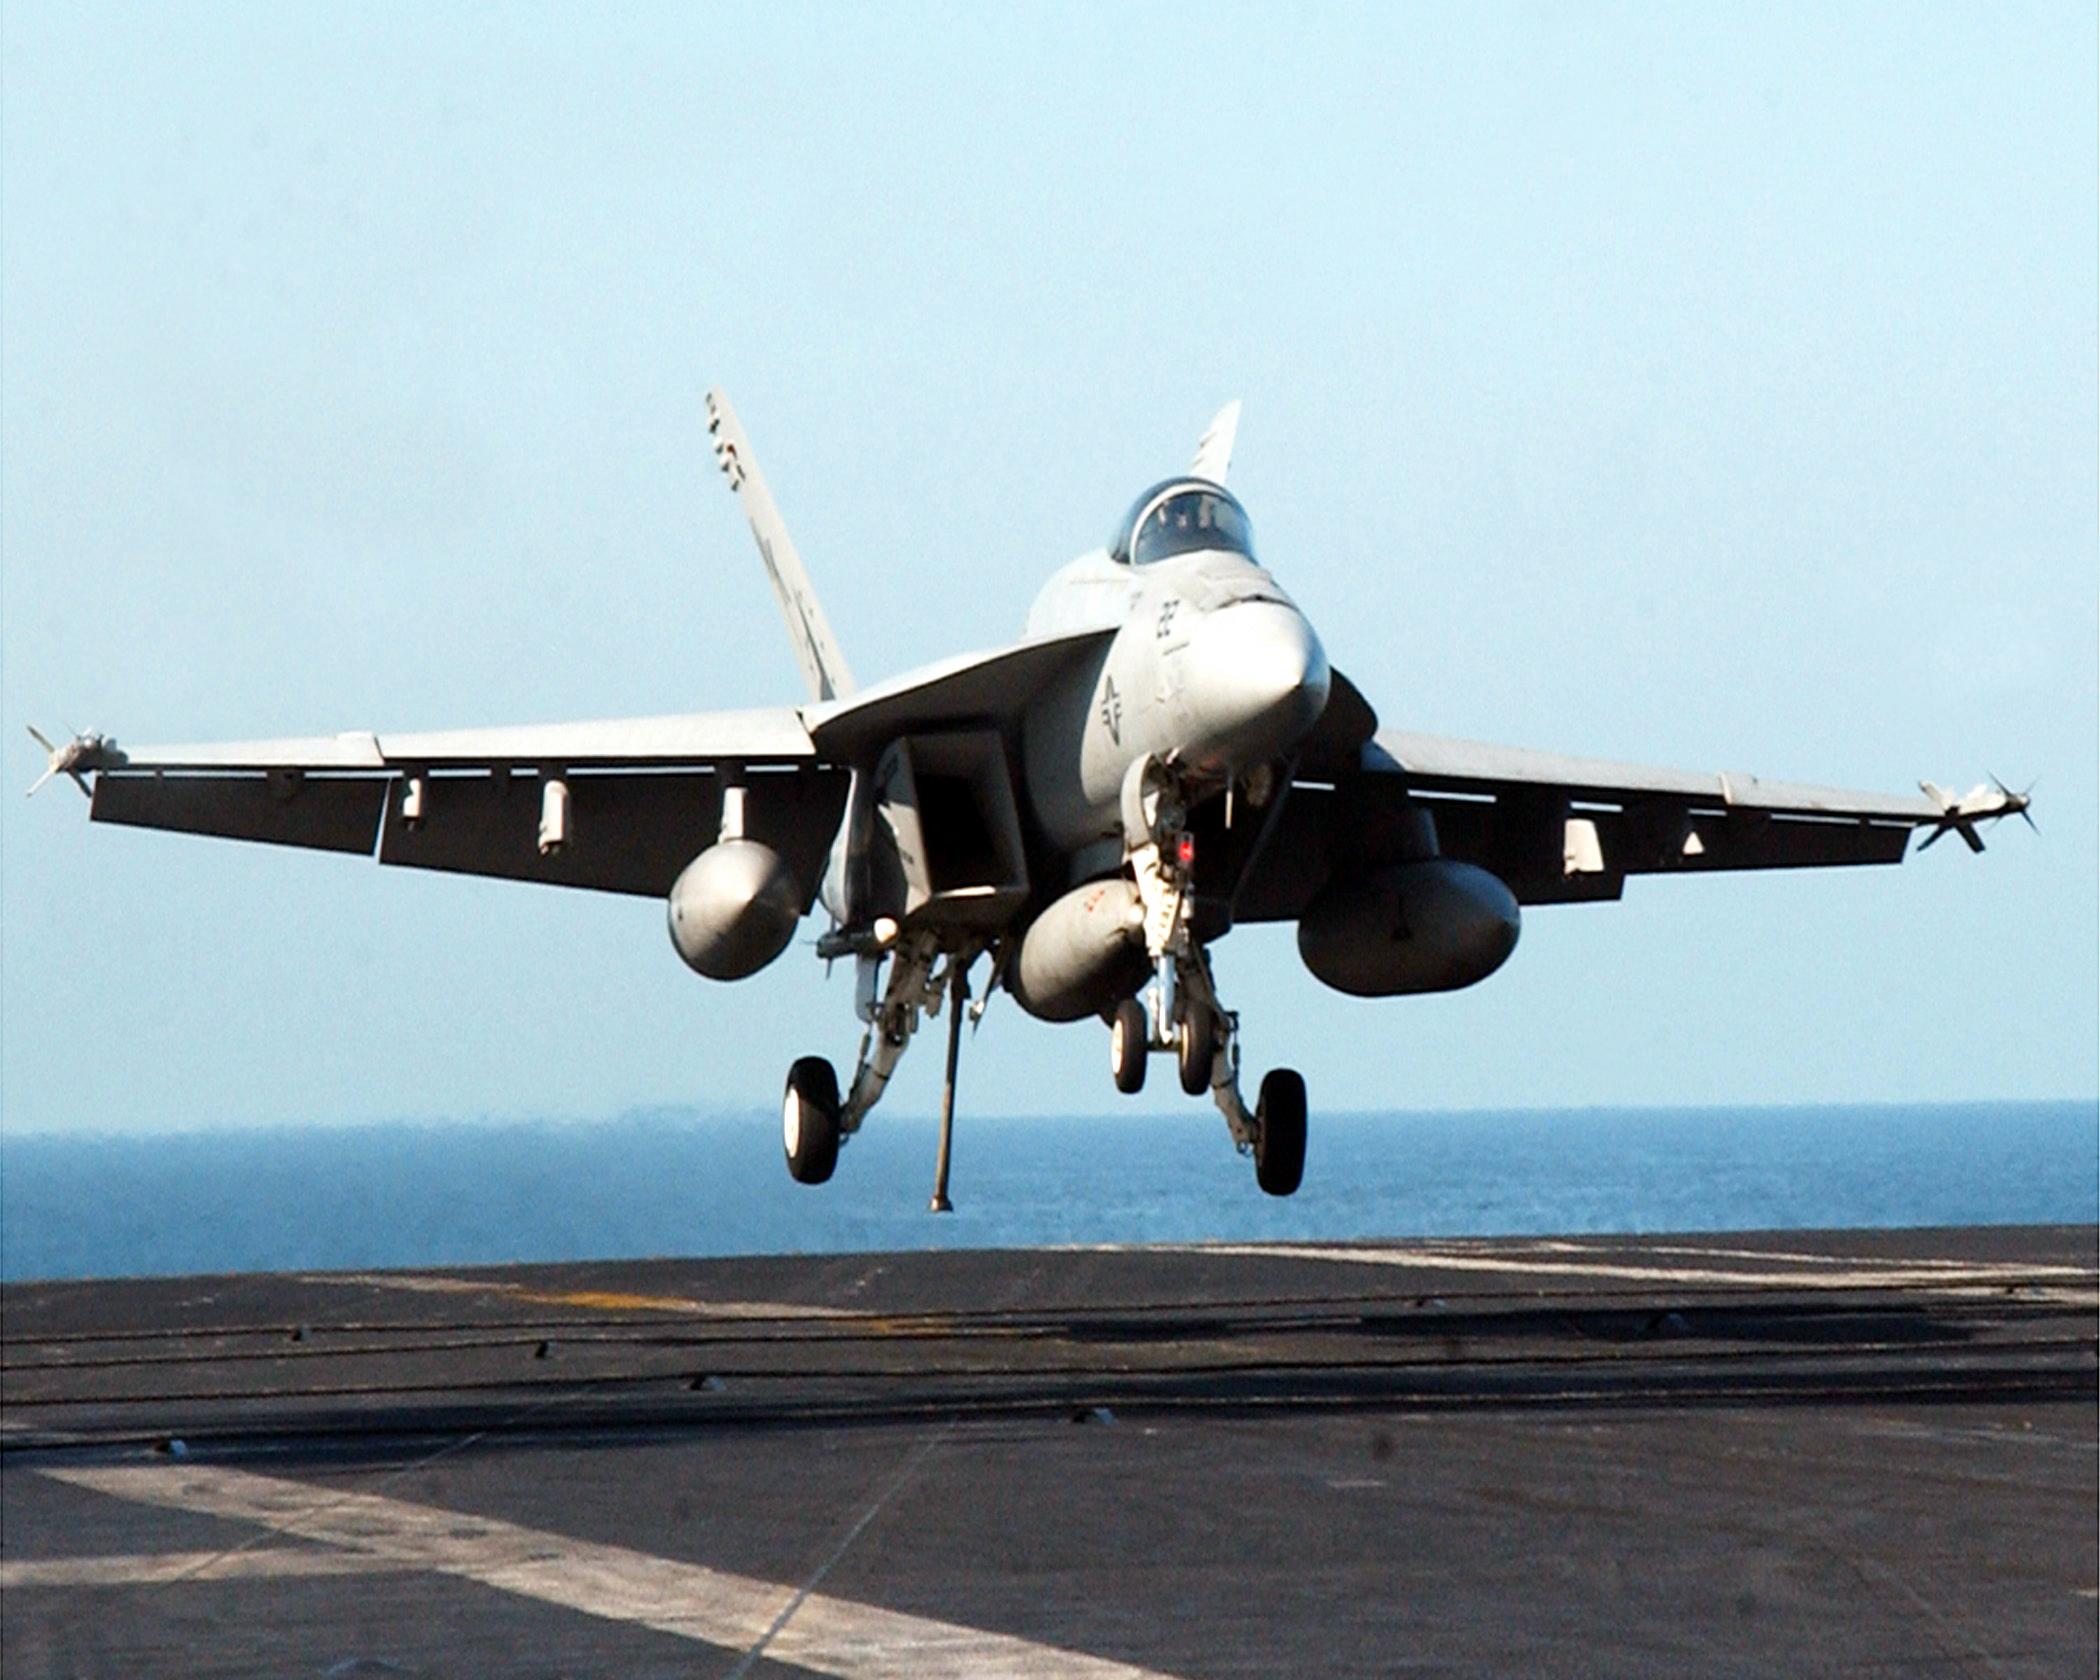 File:US Navy 021001-N-9593M-002 An F-A-18E